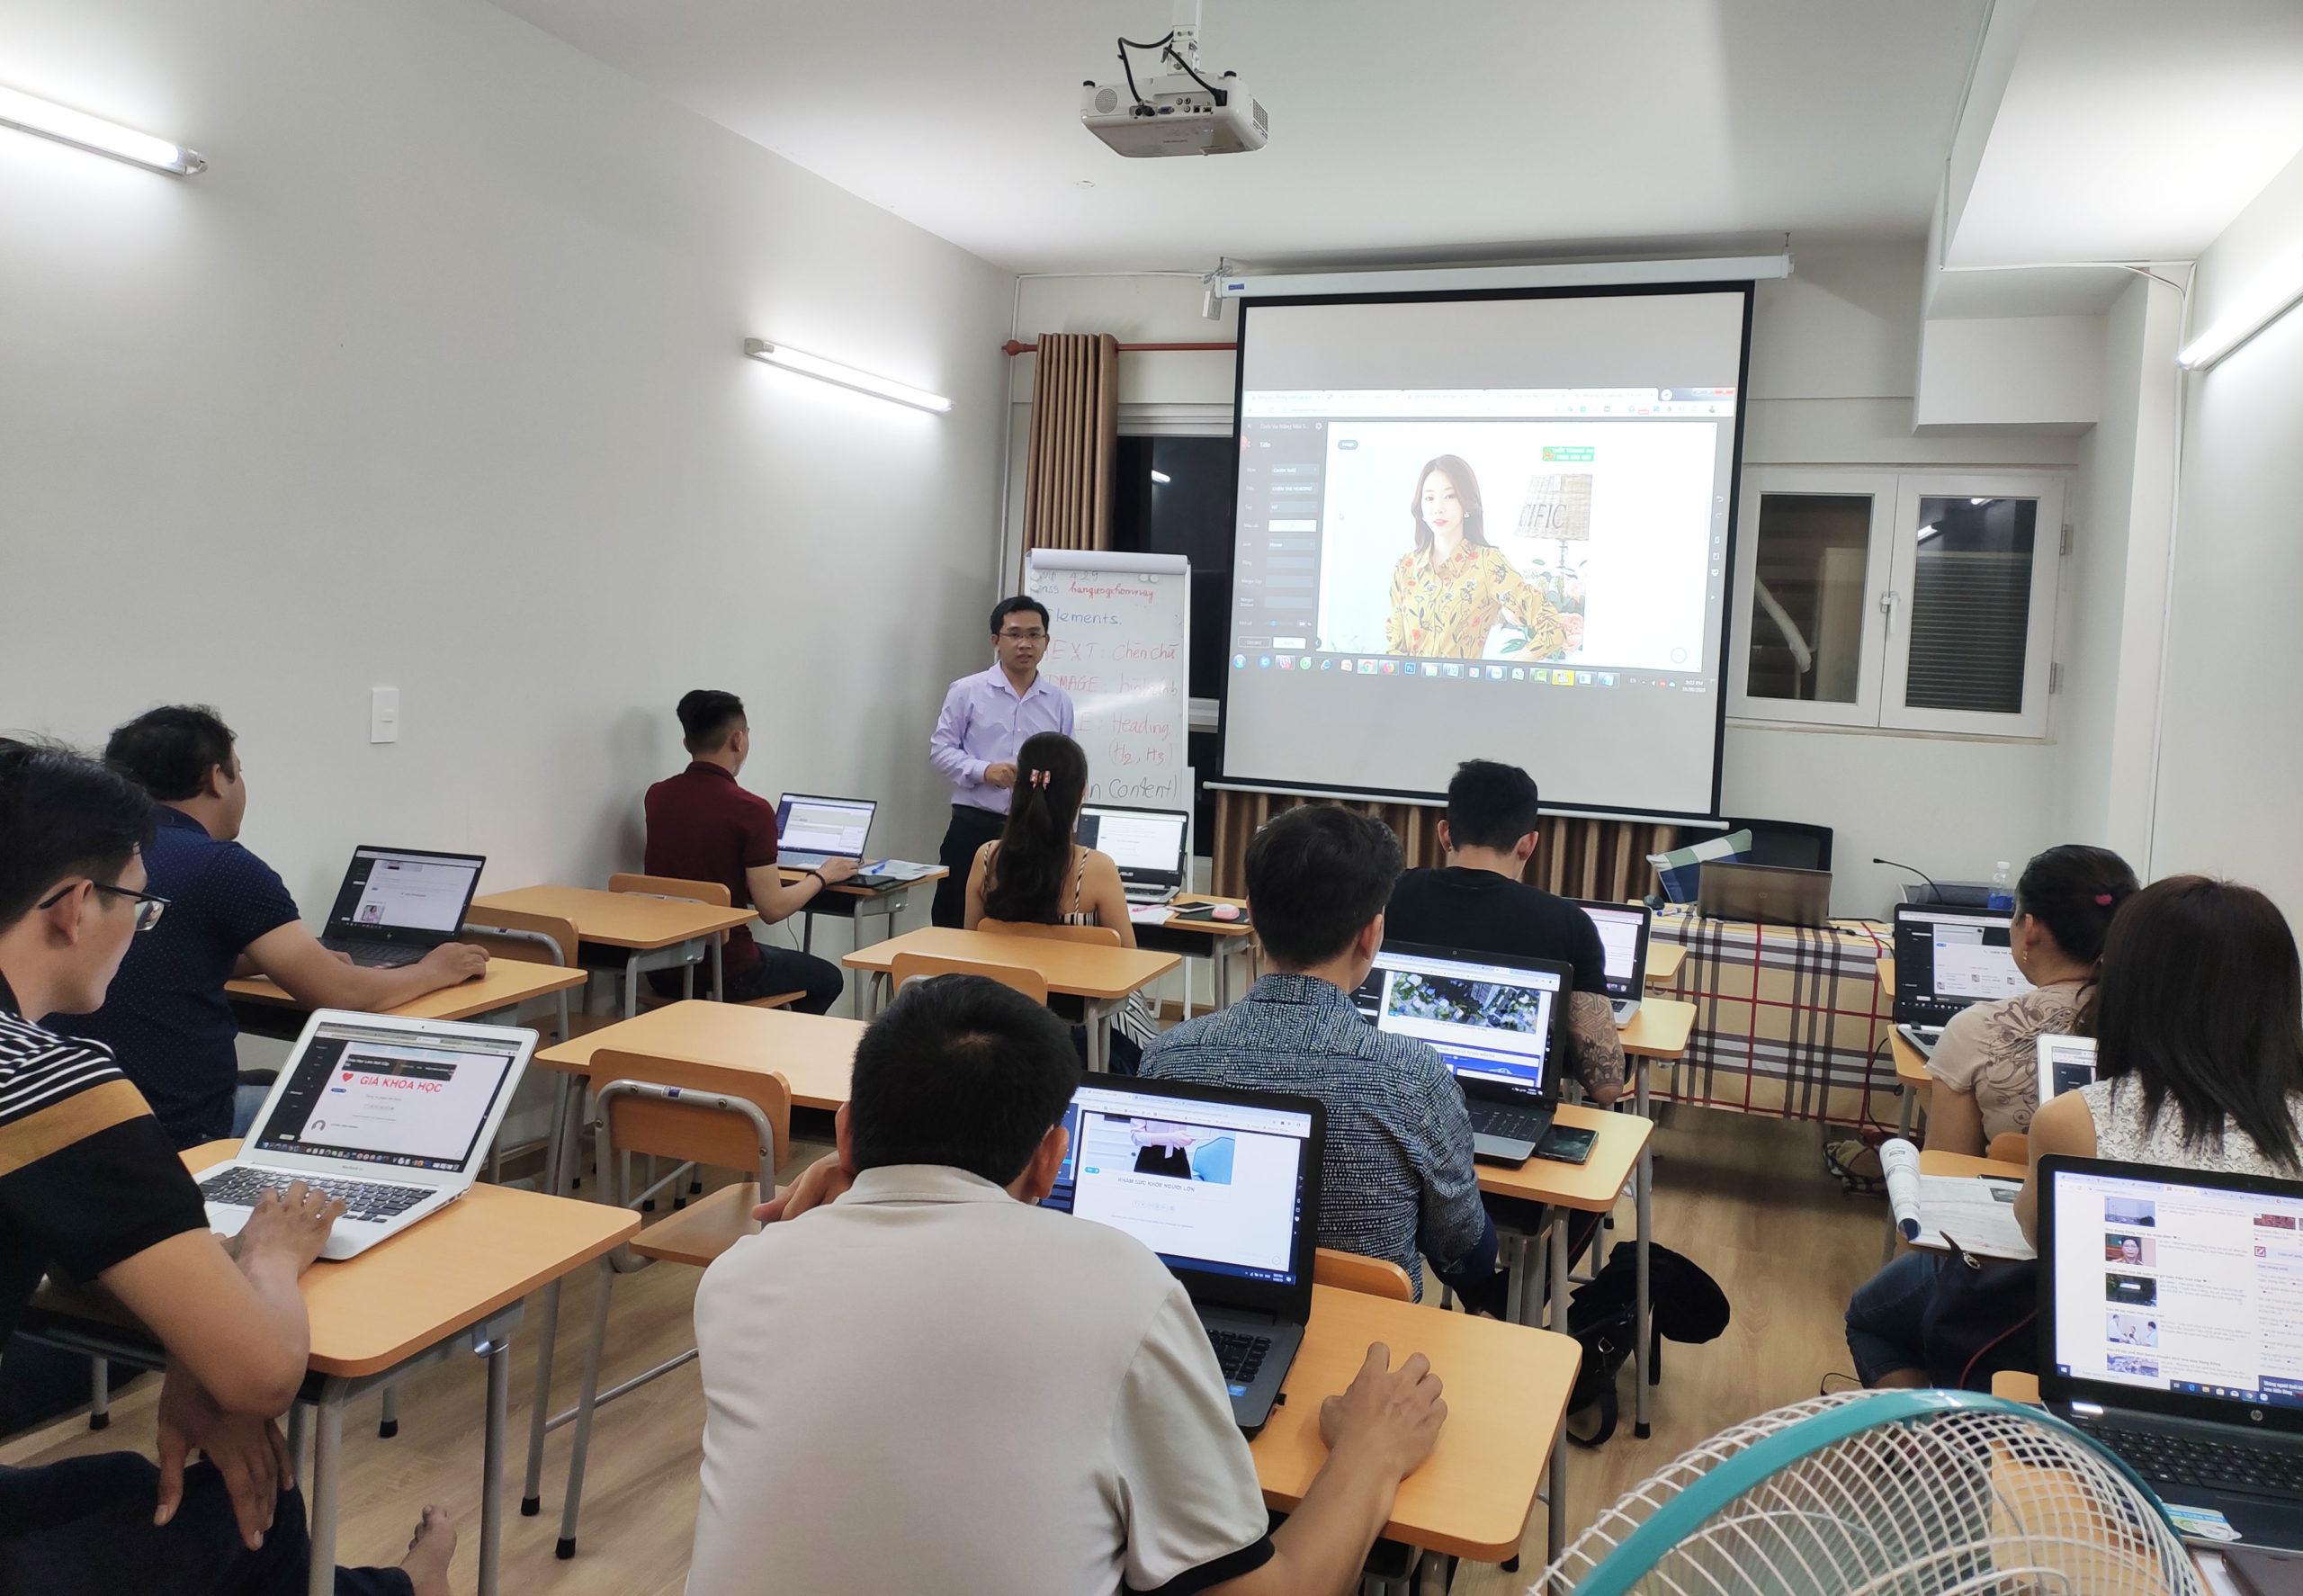 Trung tâm đào tạo Marketing Online & Digital Marketing IMTA